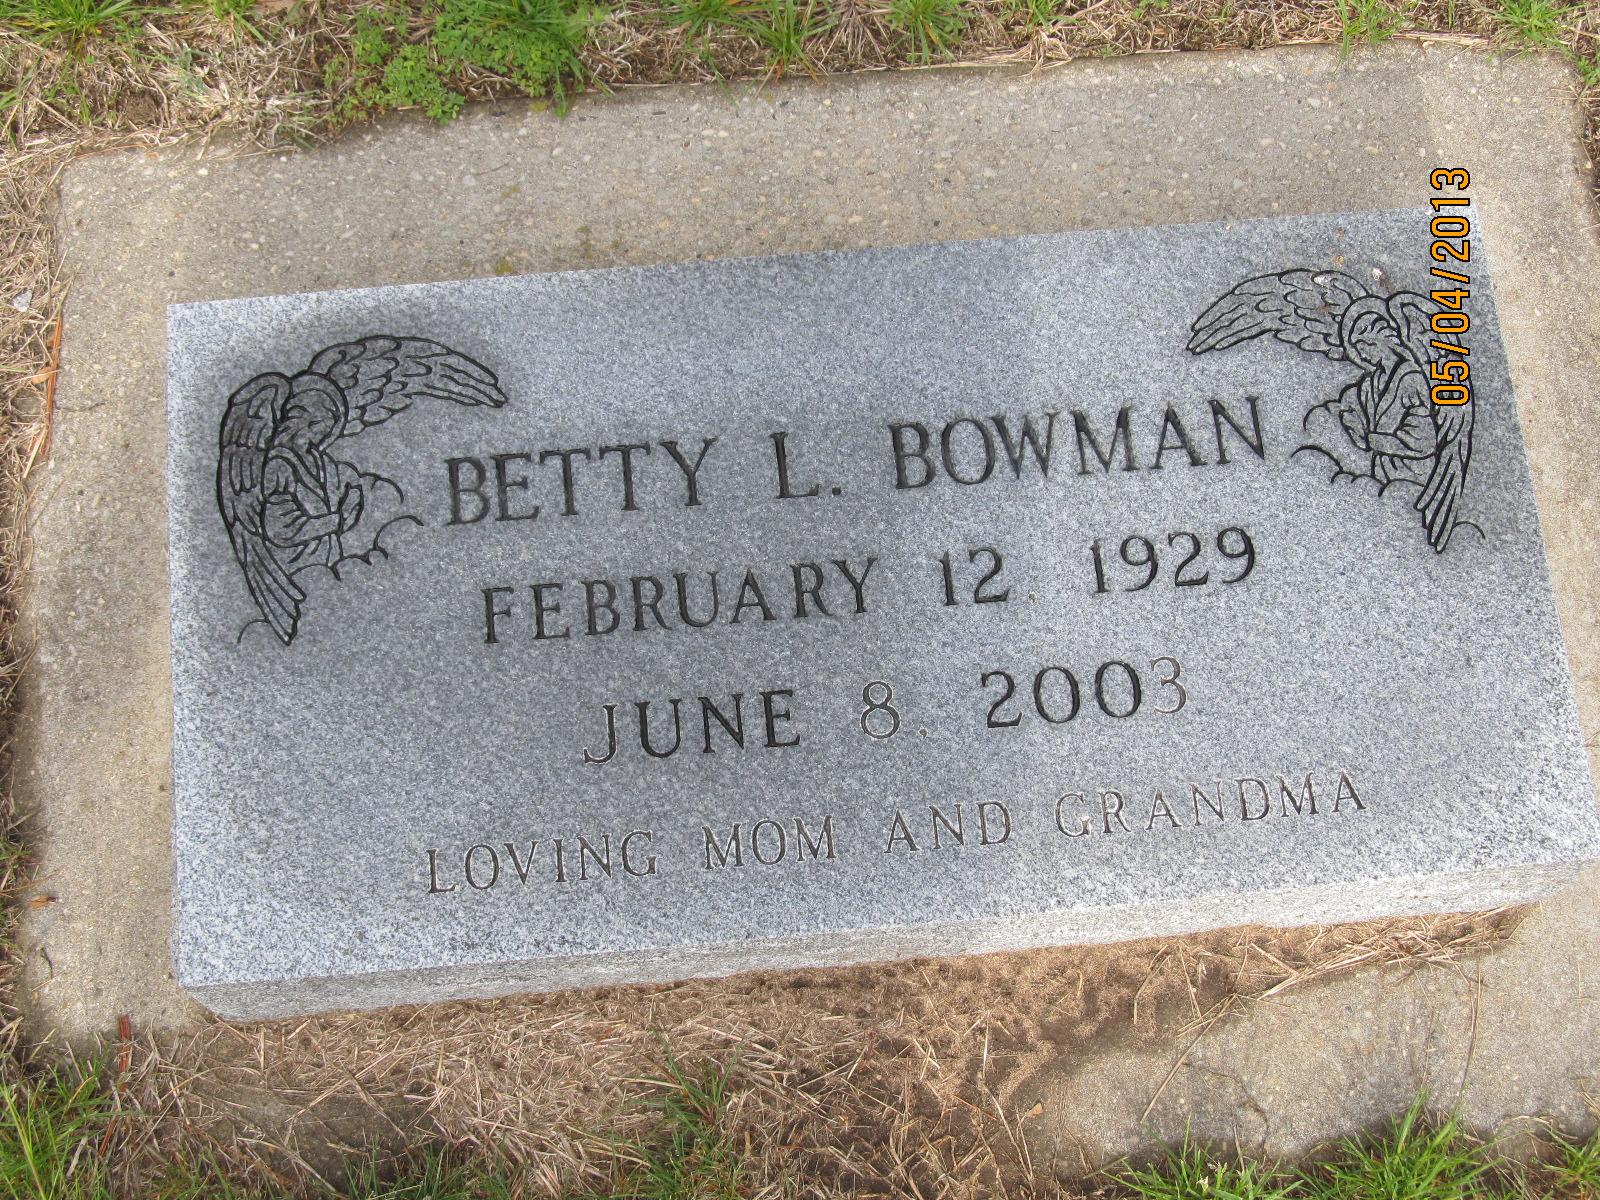 Betty L Bowman